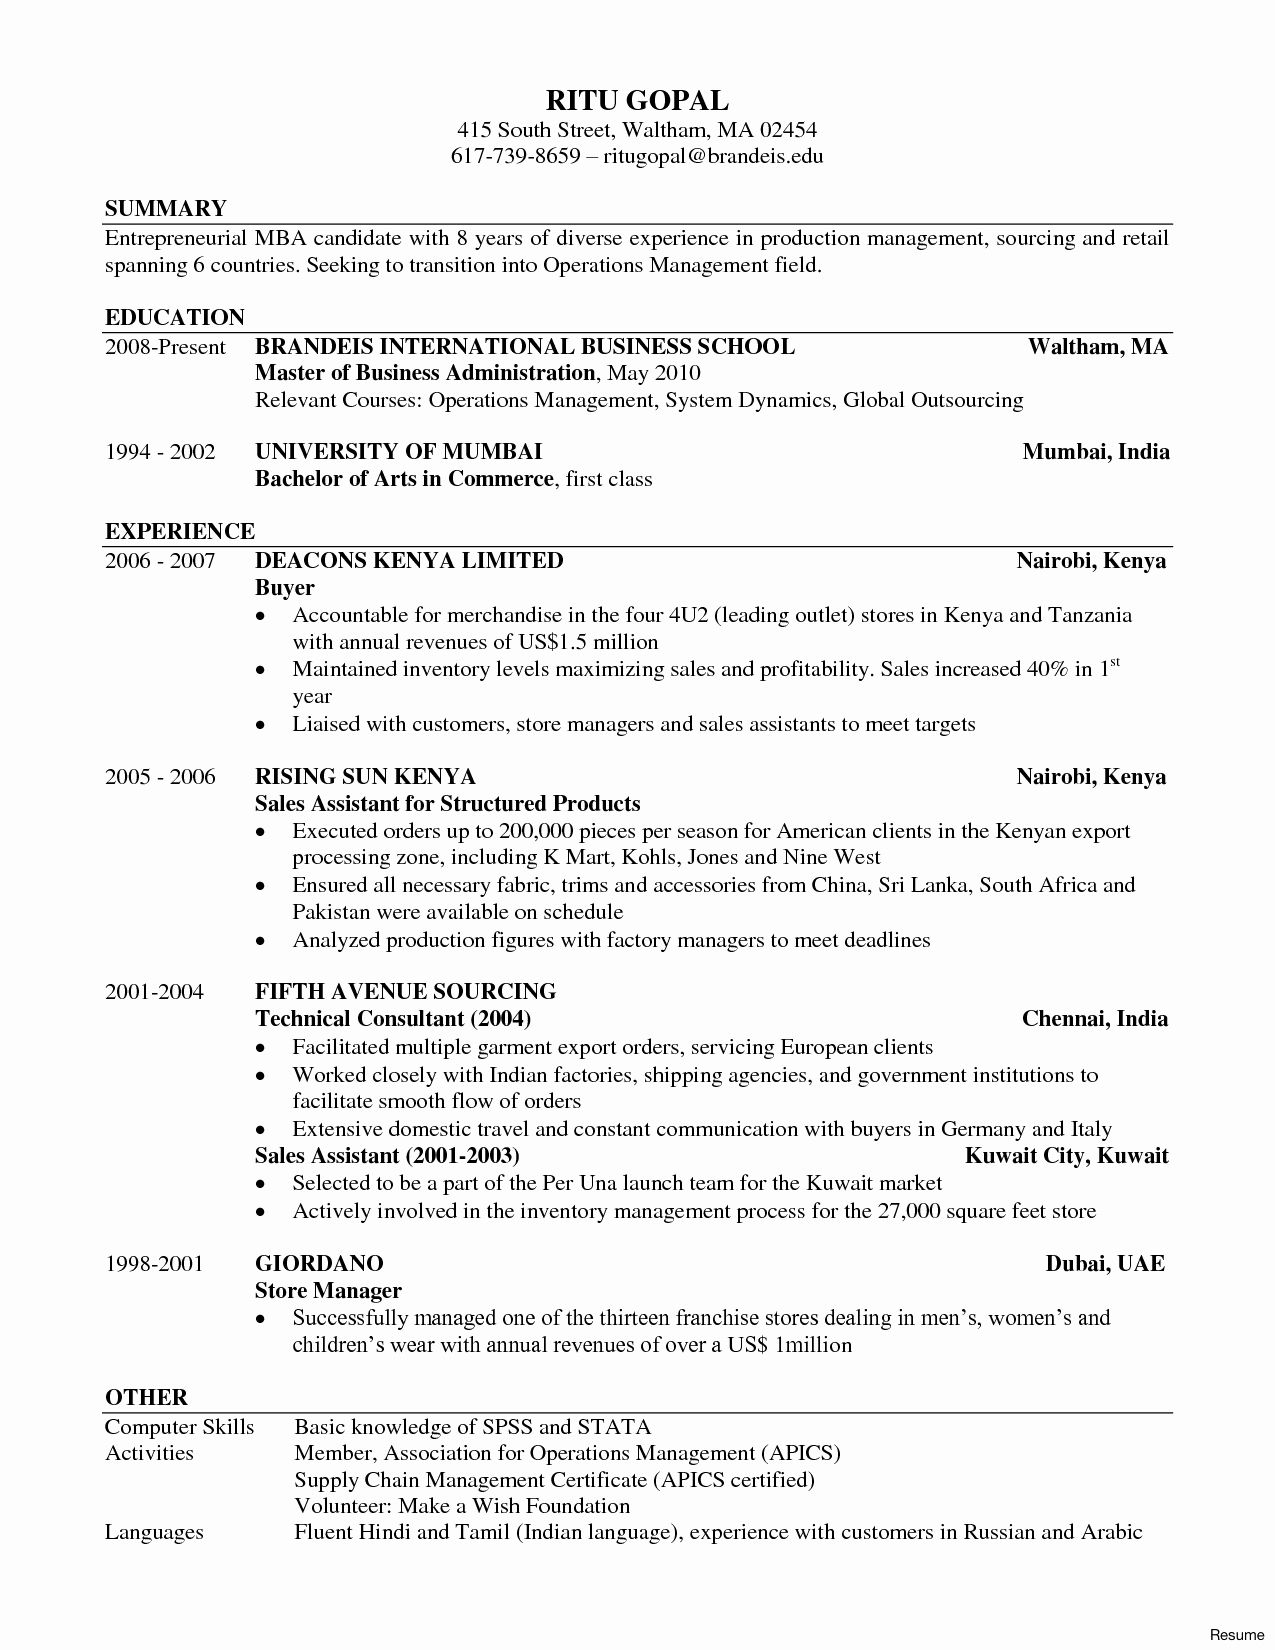 Cv Template Harvard Resume Format Business Resume Template Business Resume Business Letter Sample